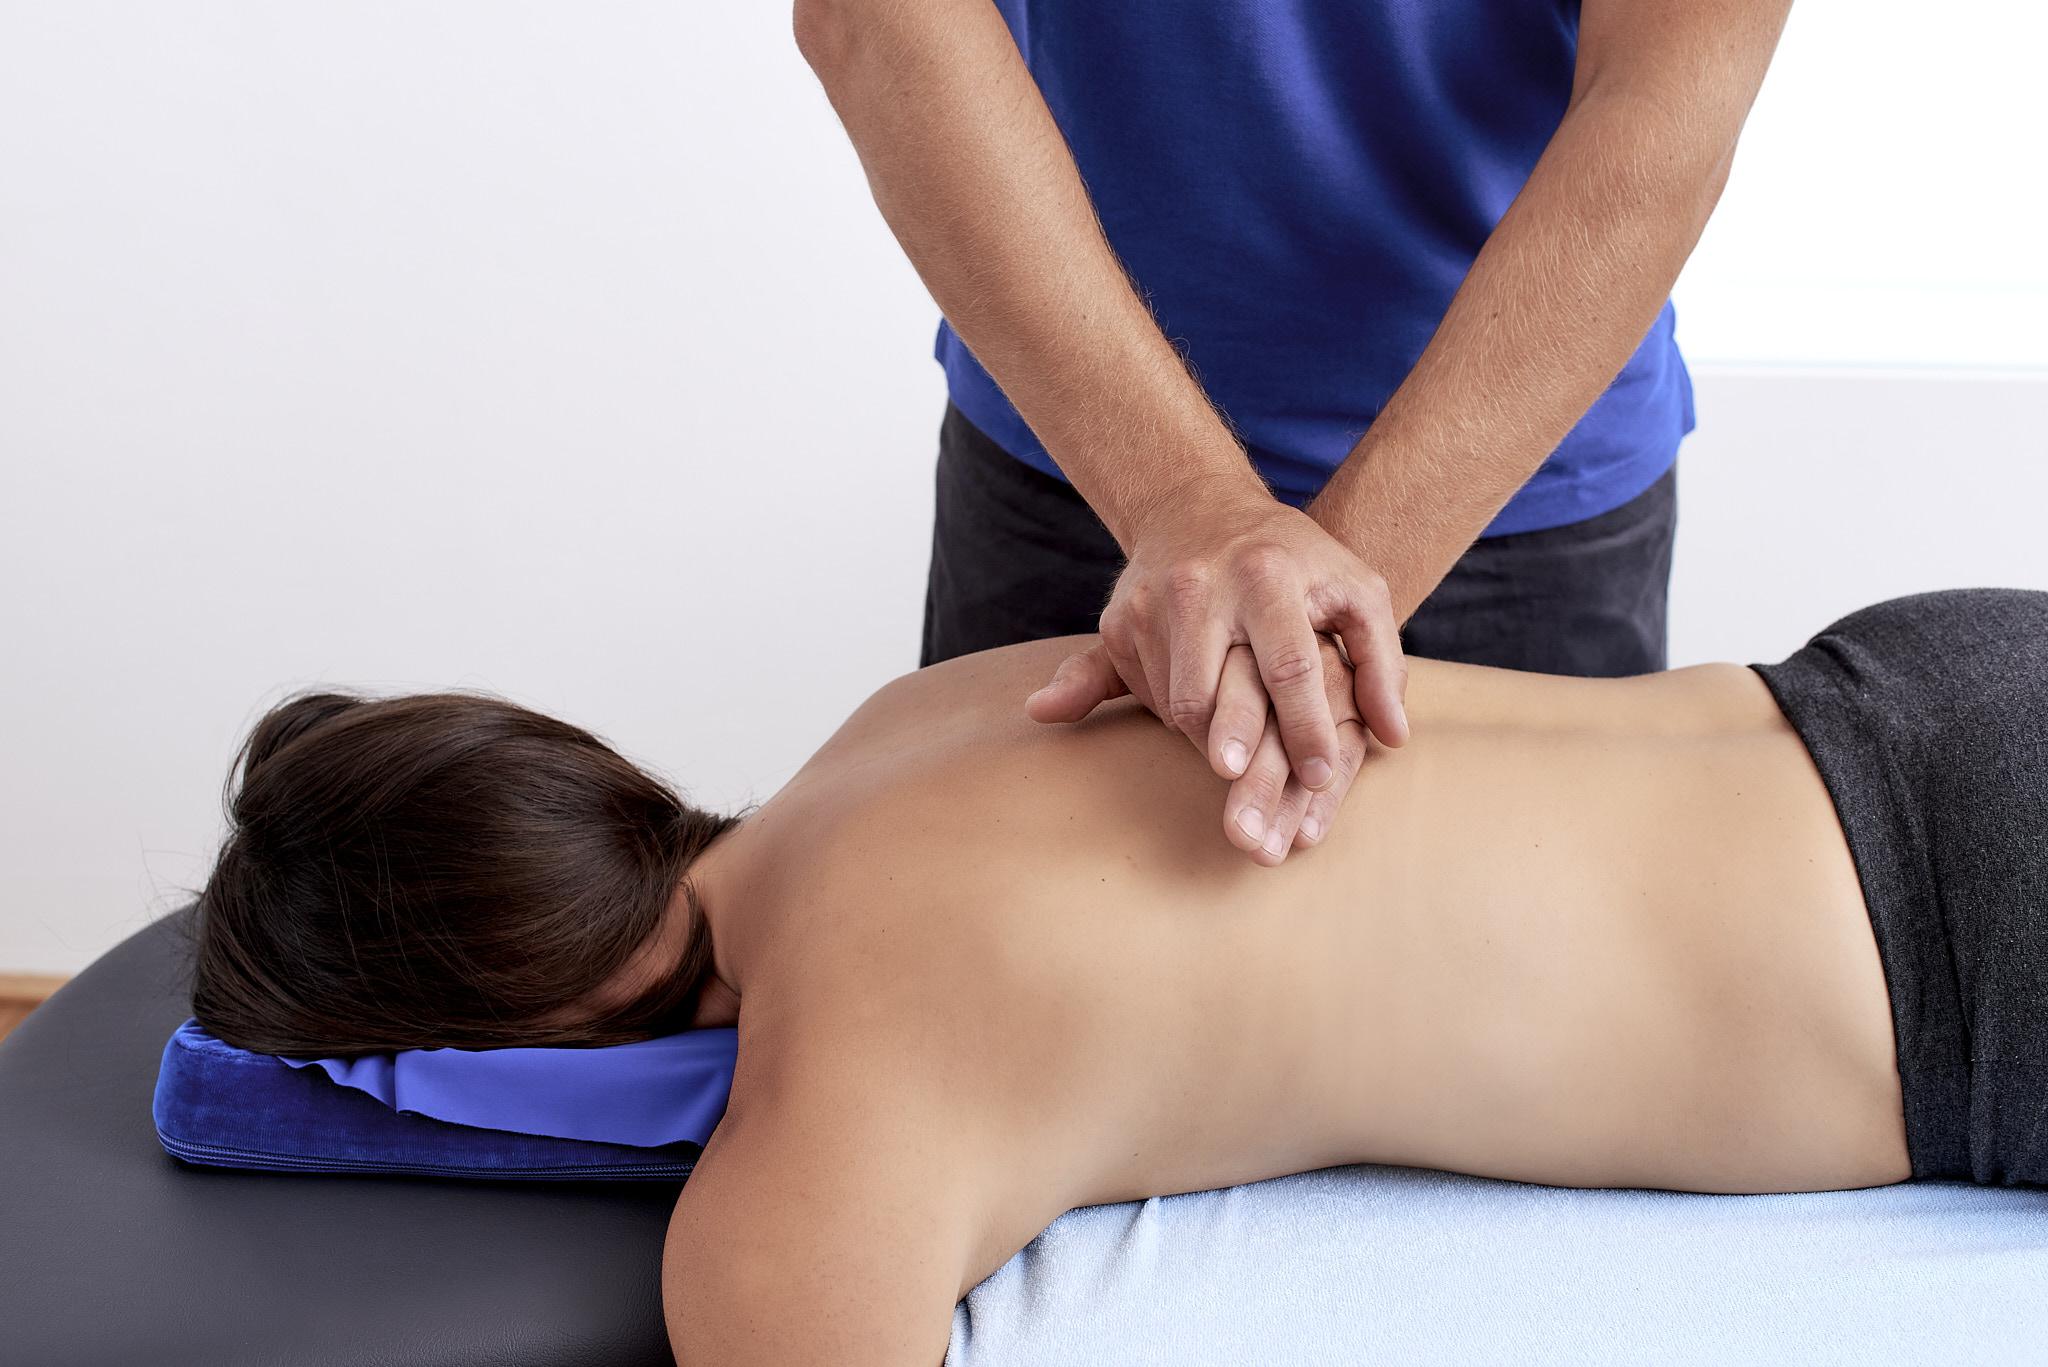 Manuelle Therapie Wirbelsäule Physiotherapie Connert Innsbruck